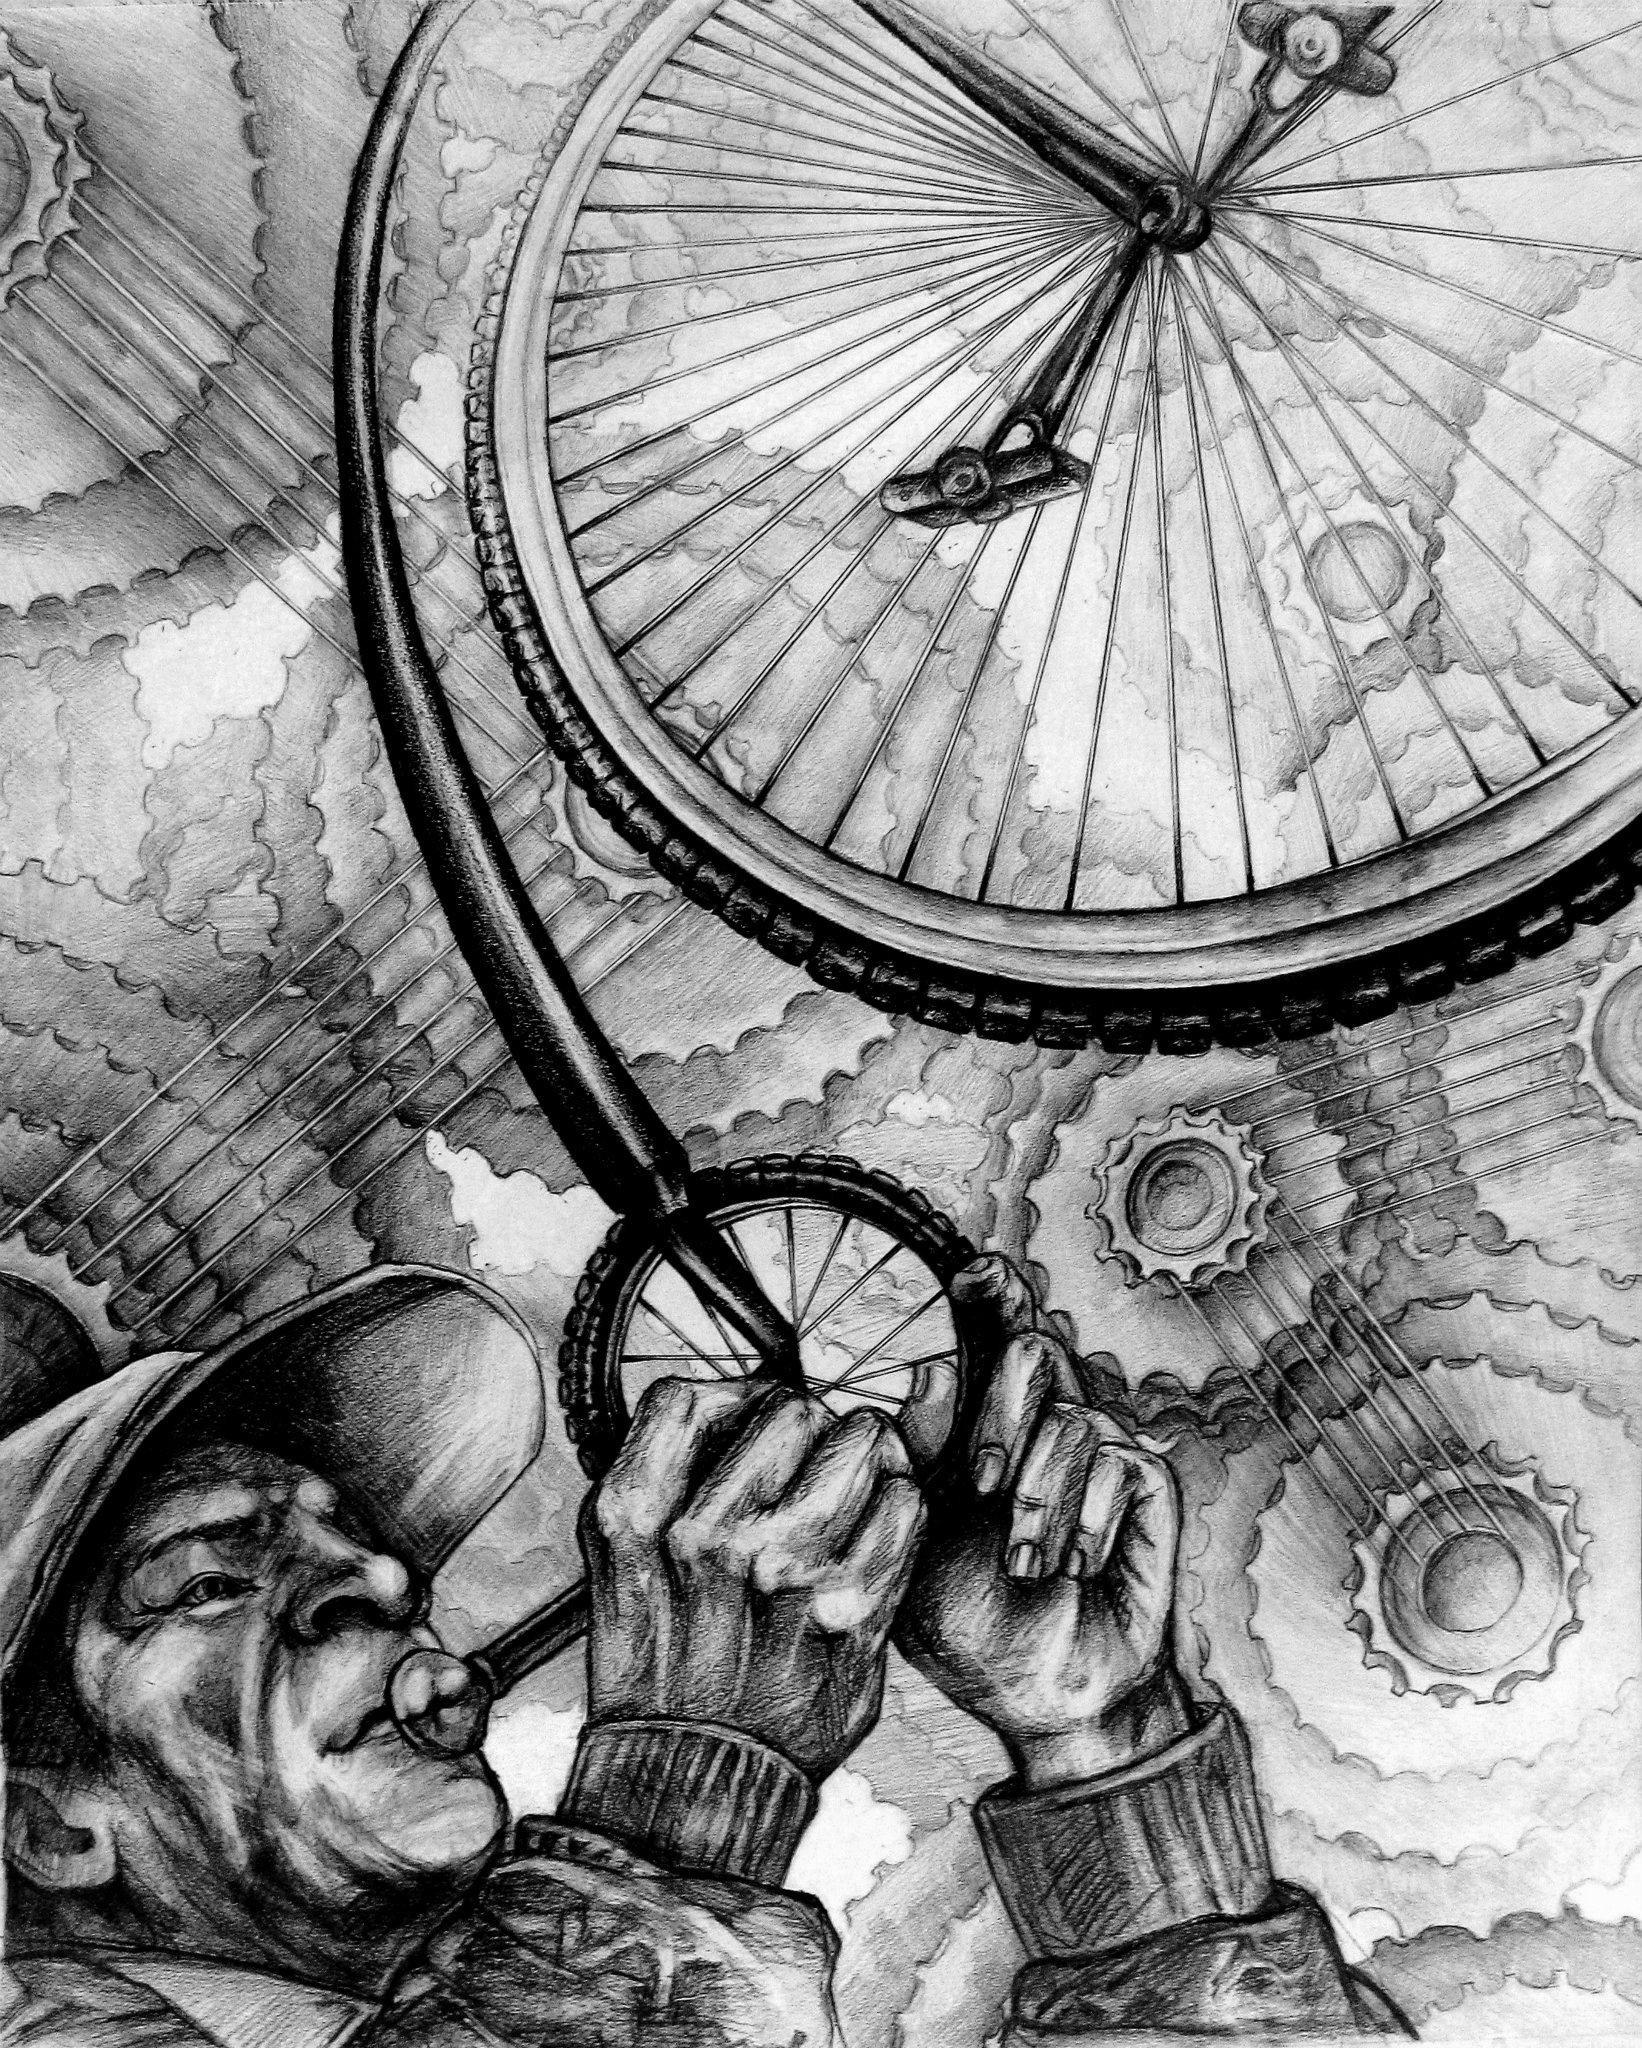 RISD BIKE - Submission for RISD's prompt: Draw A Bike18' x 24' Graphite